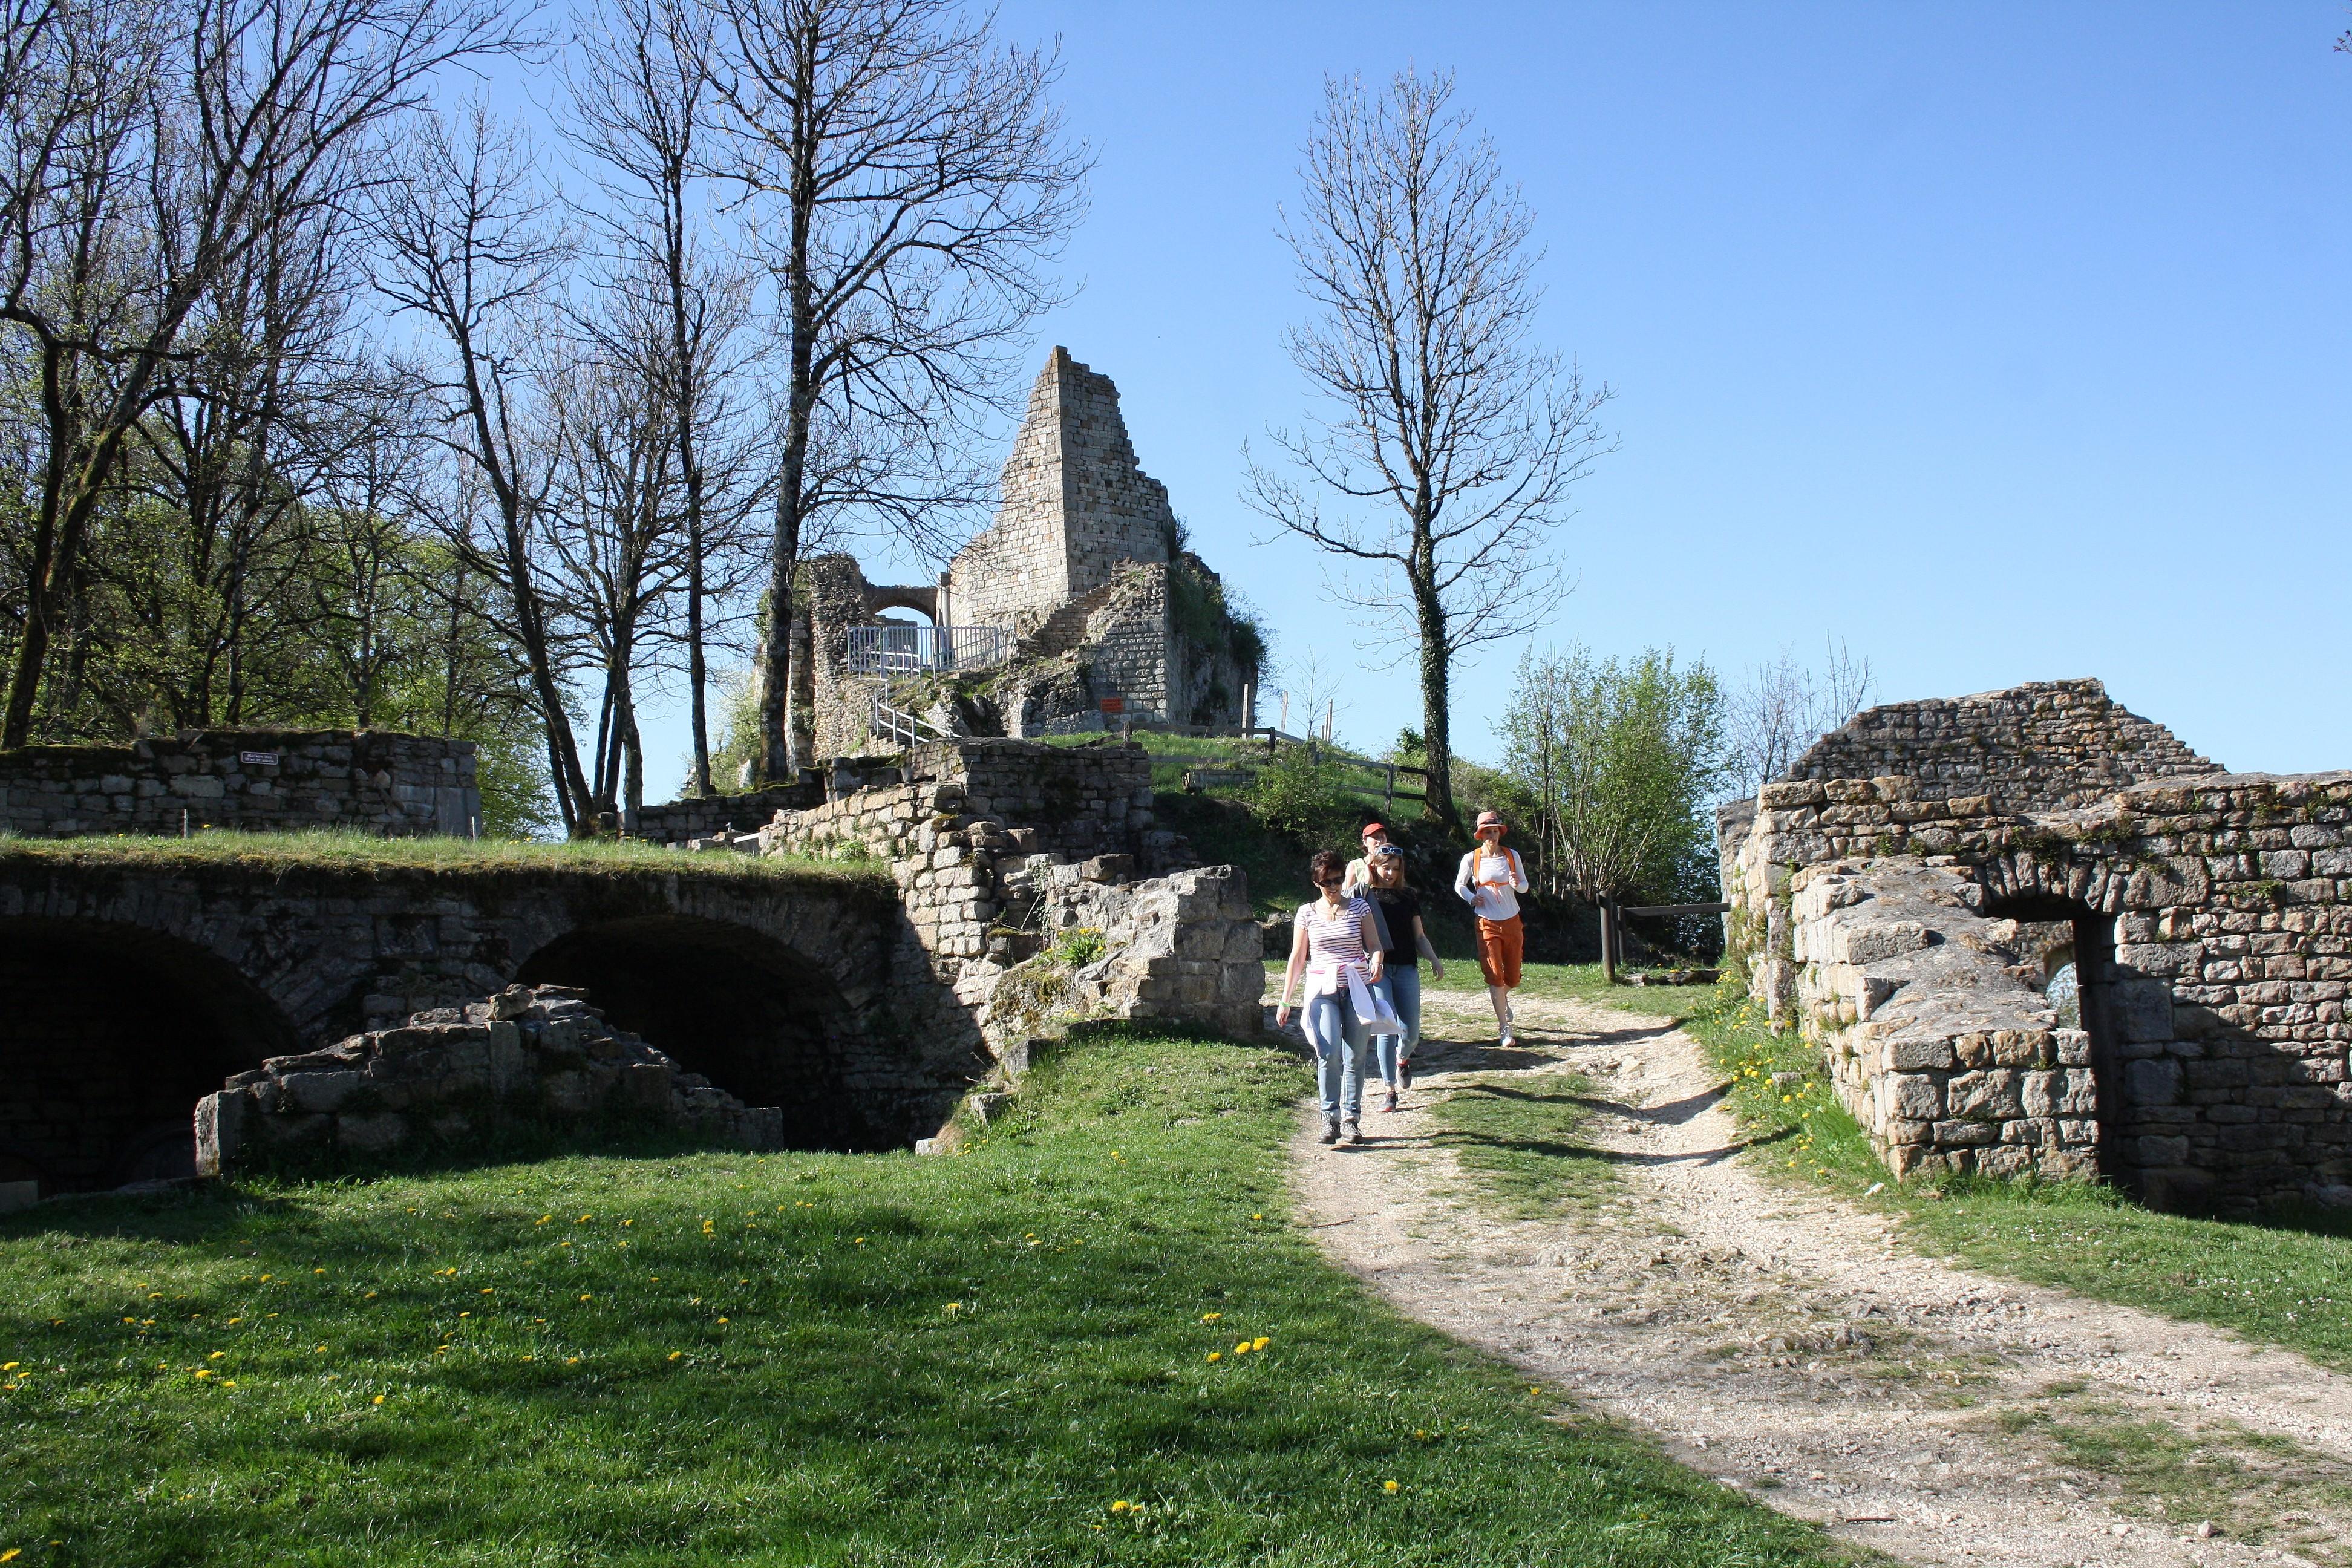 2017-04-09 - Trail-Montfaucon (190)